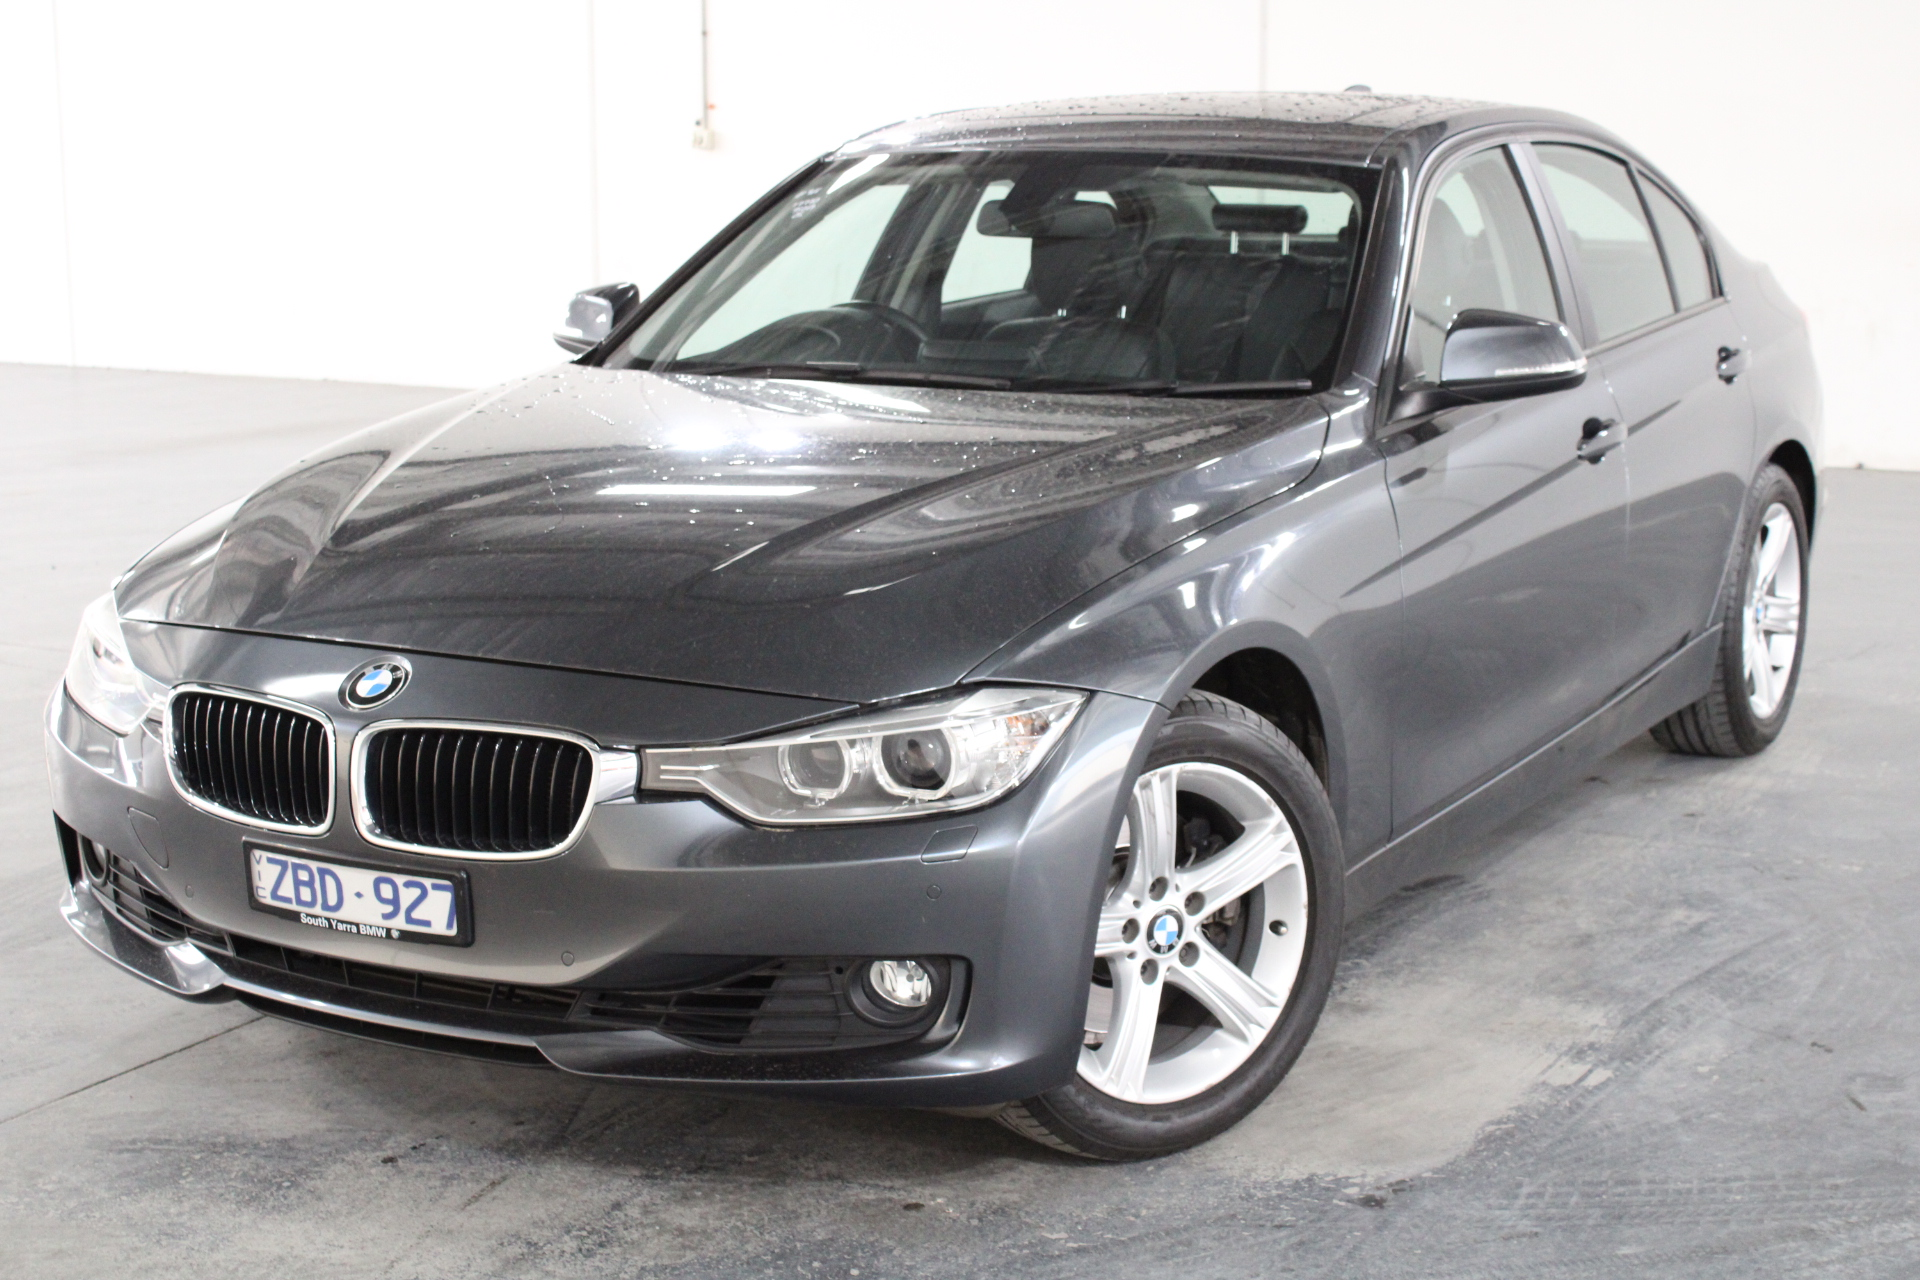 2012 BMW 3 Series 328i F30 Automatic 55,618kms